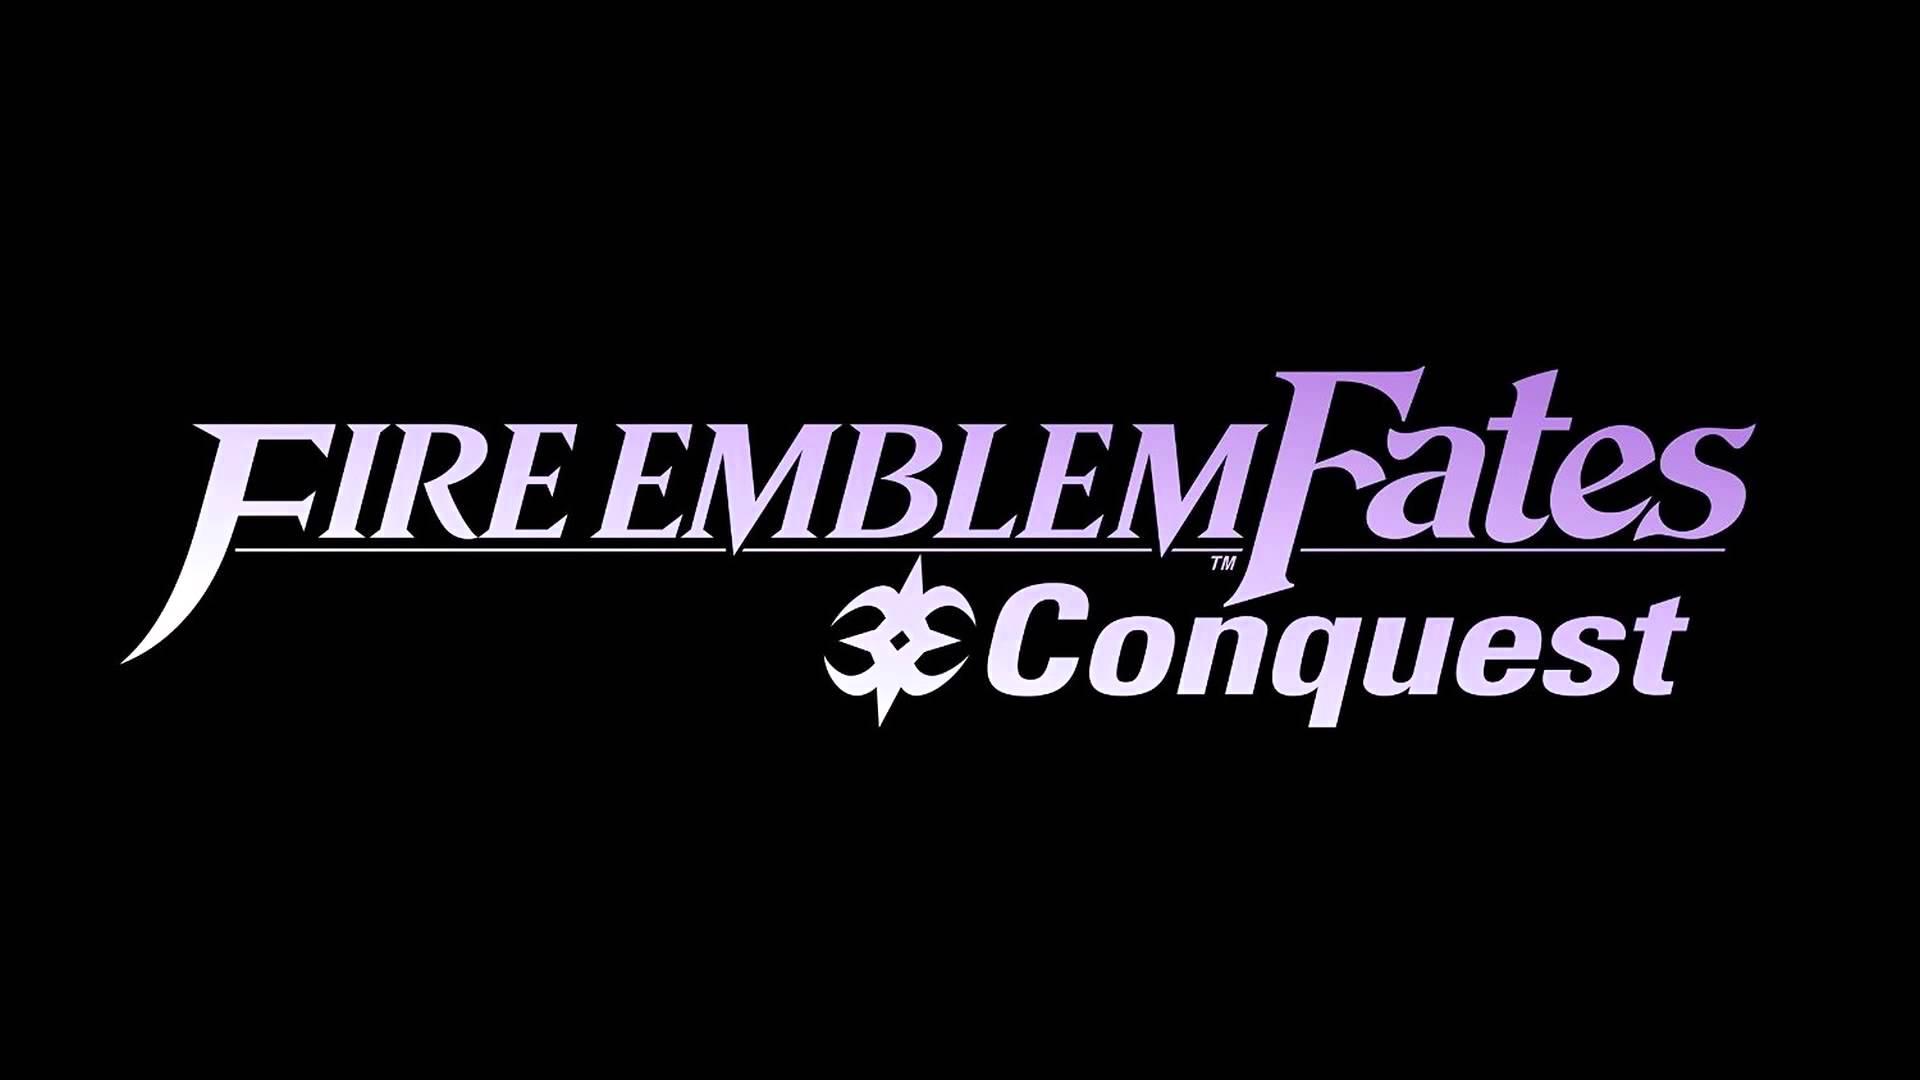 Dark Wastes (Fire) - Fire Emblem Fates: Conquest